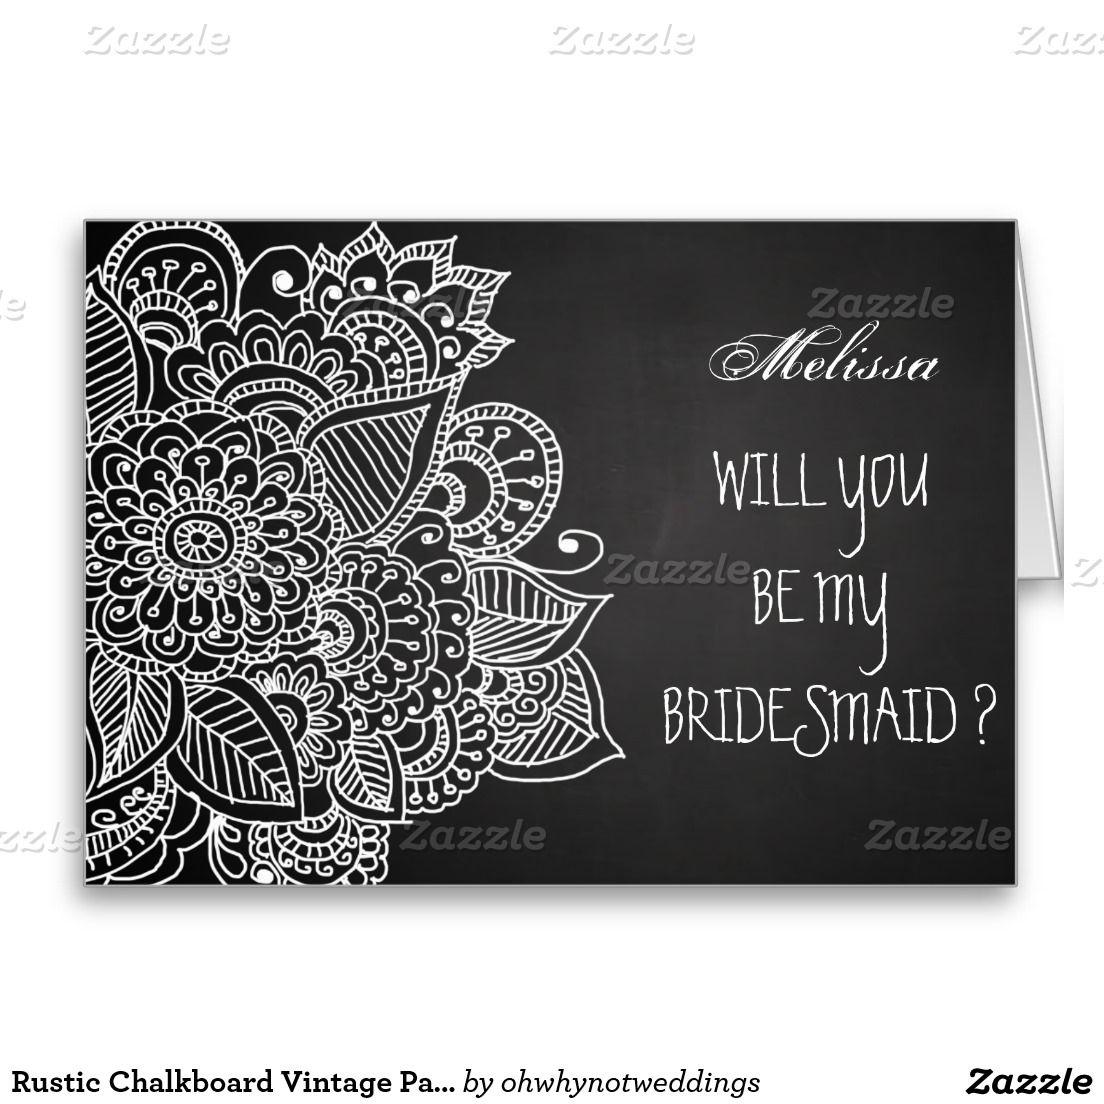 Rustic Chalkboard Vintage Paisley Bridesmaid